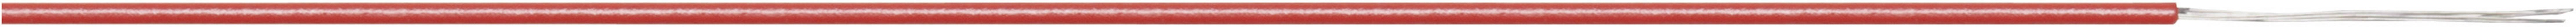 Kabel LappKabel LiYv (49900275), 1x 0,08 mm², 1 m, žlutá